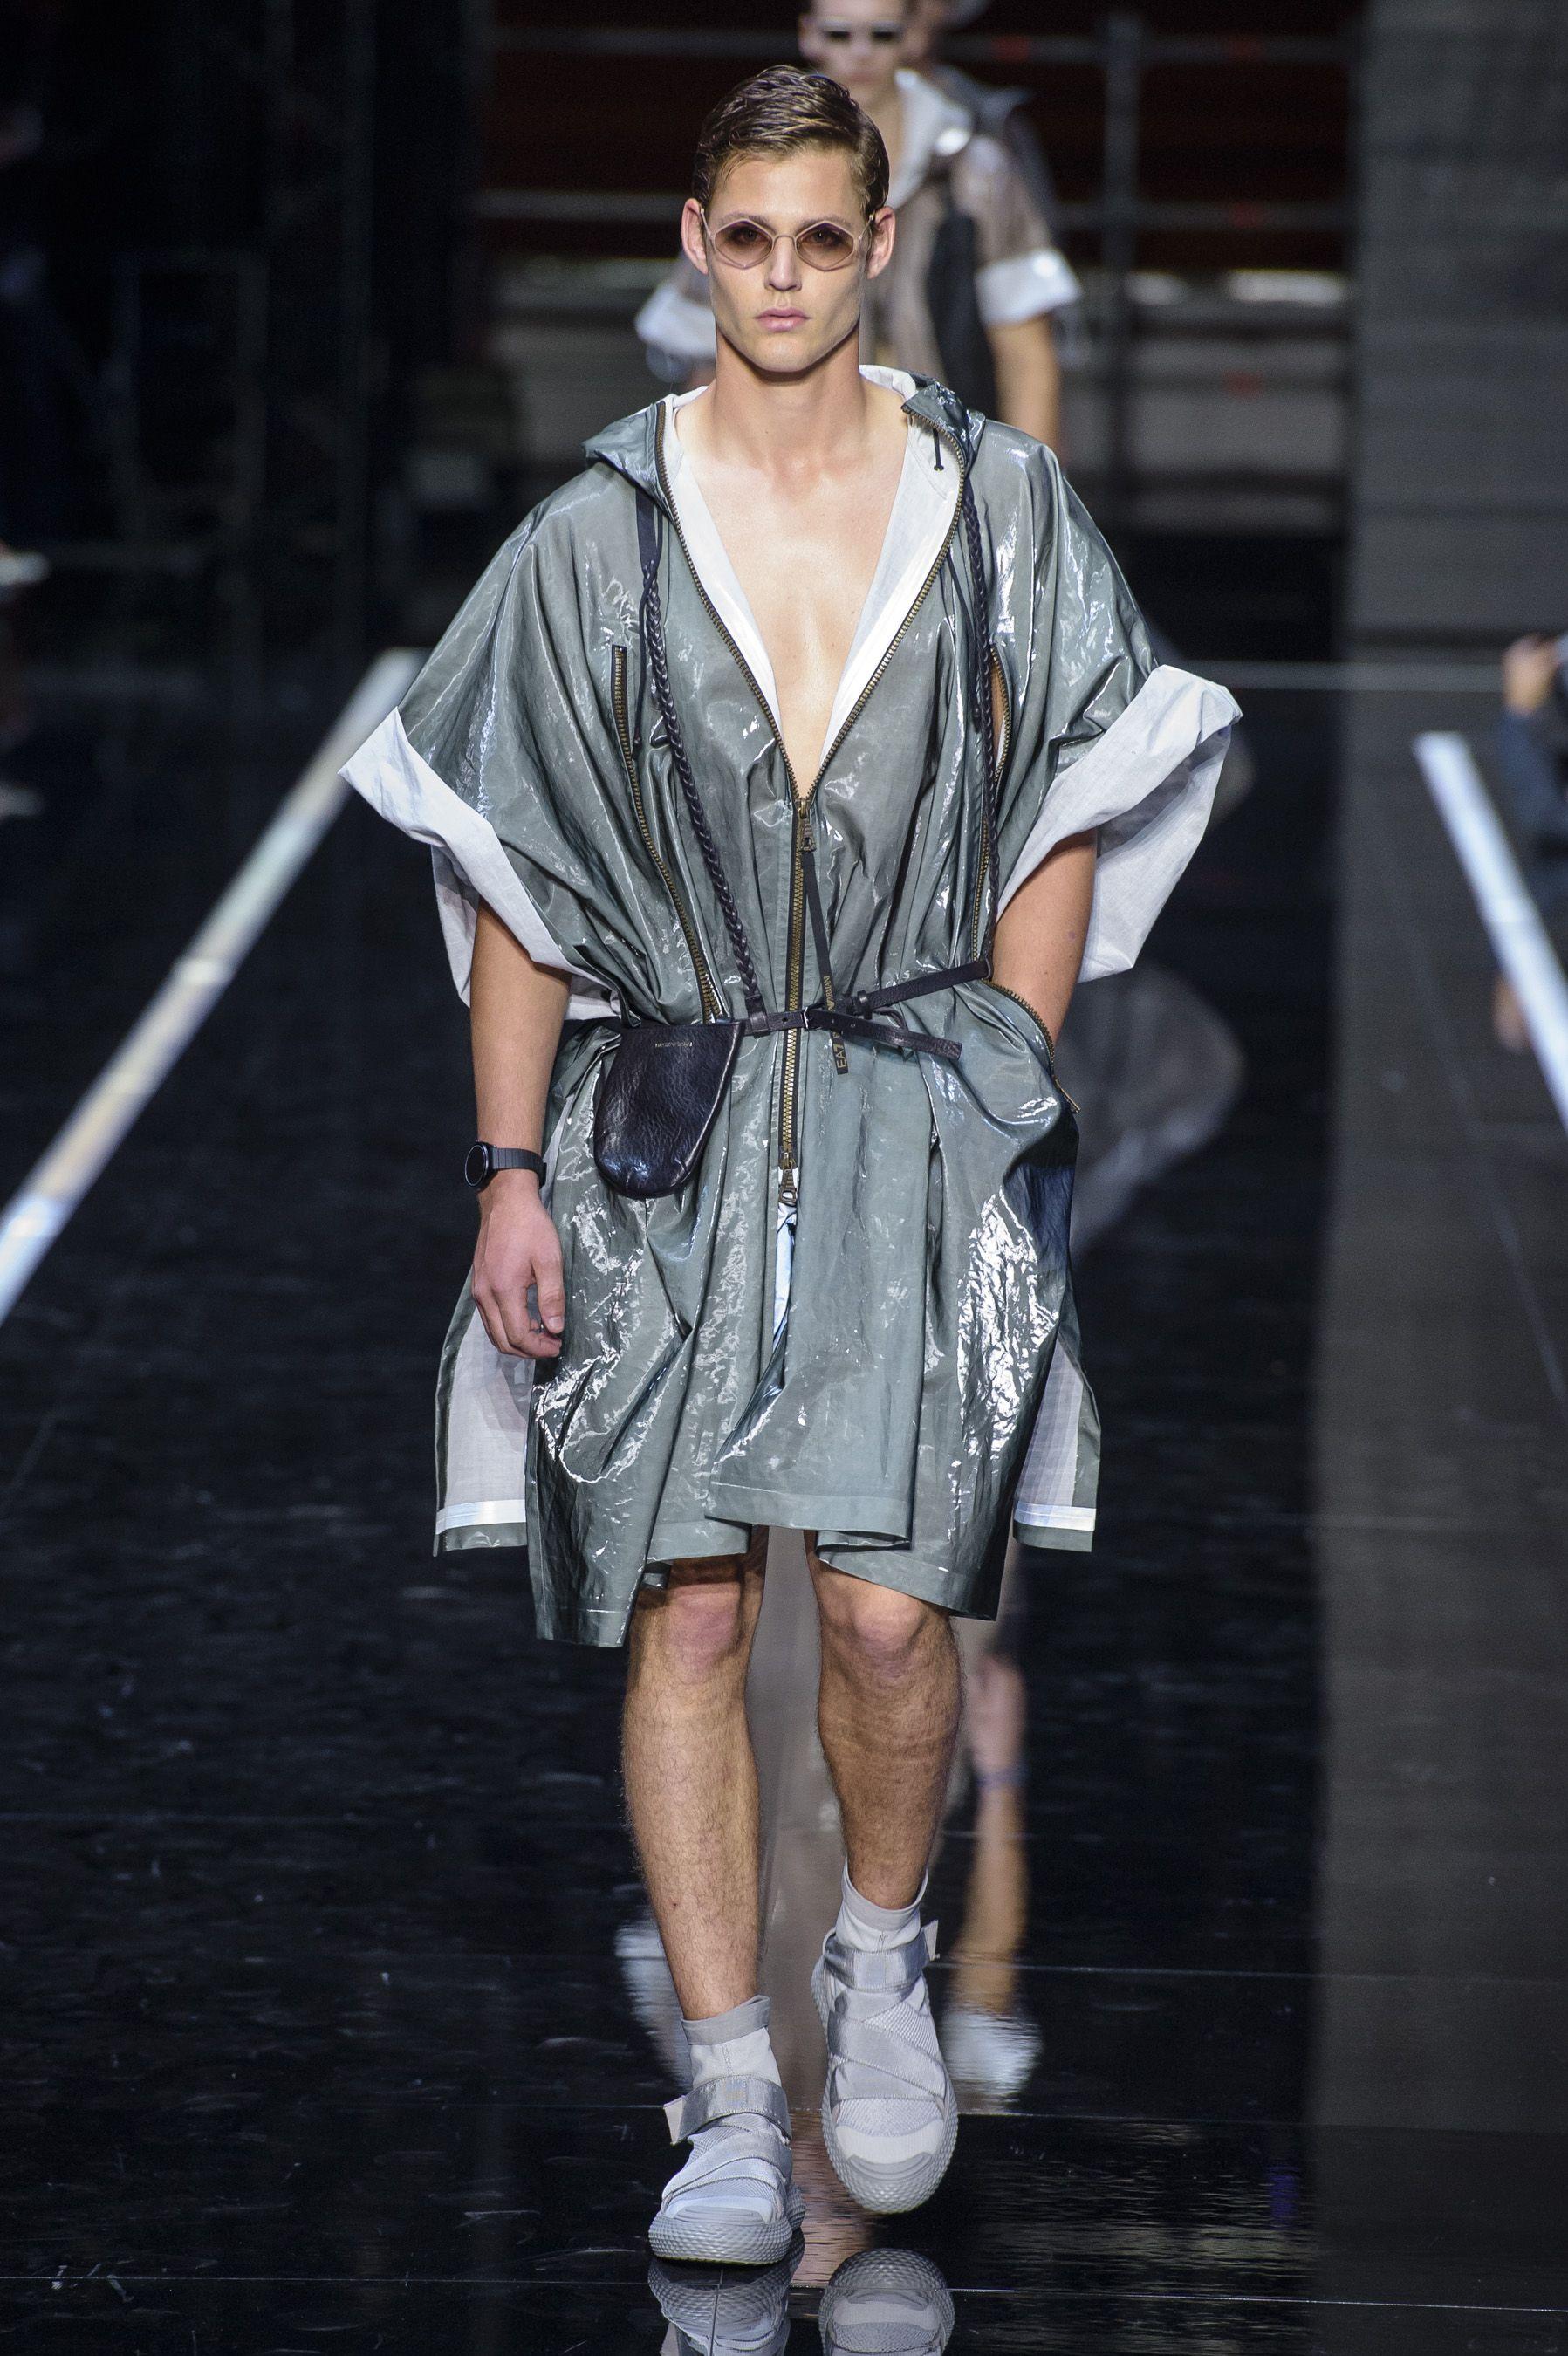 Emporio Armani, Emporio Armani SS 19, MFW, MFW SS 19, Milano fashion week, fashion week, Milano, primavera estate 2019, sfilate, real time women SS 19